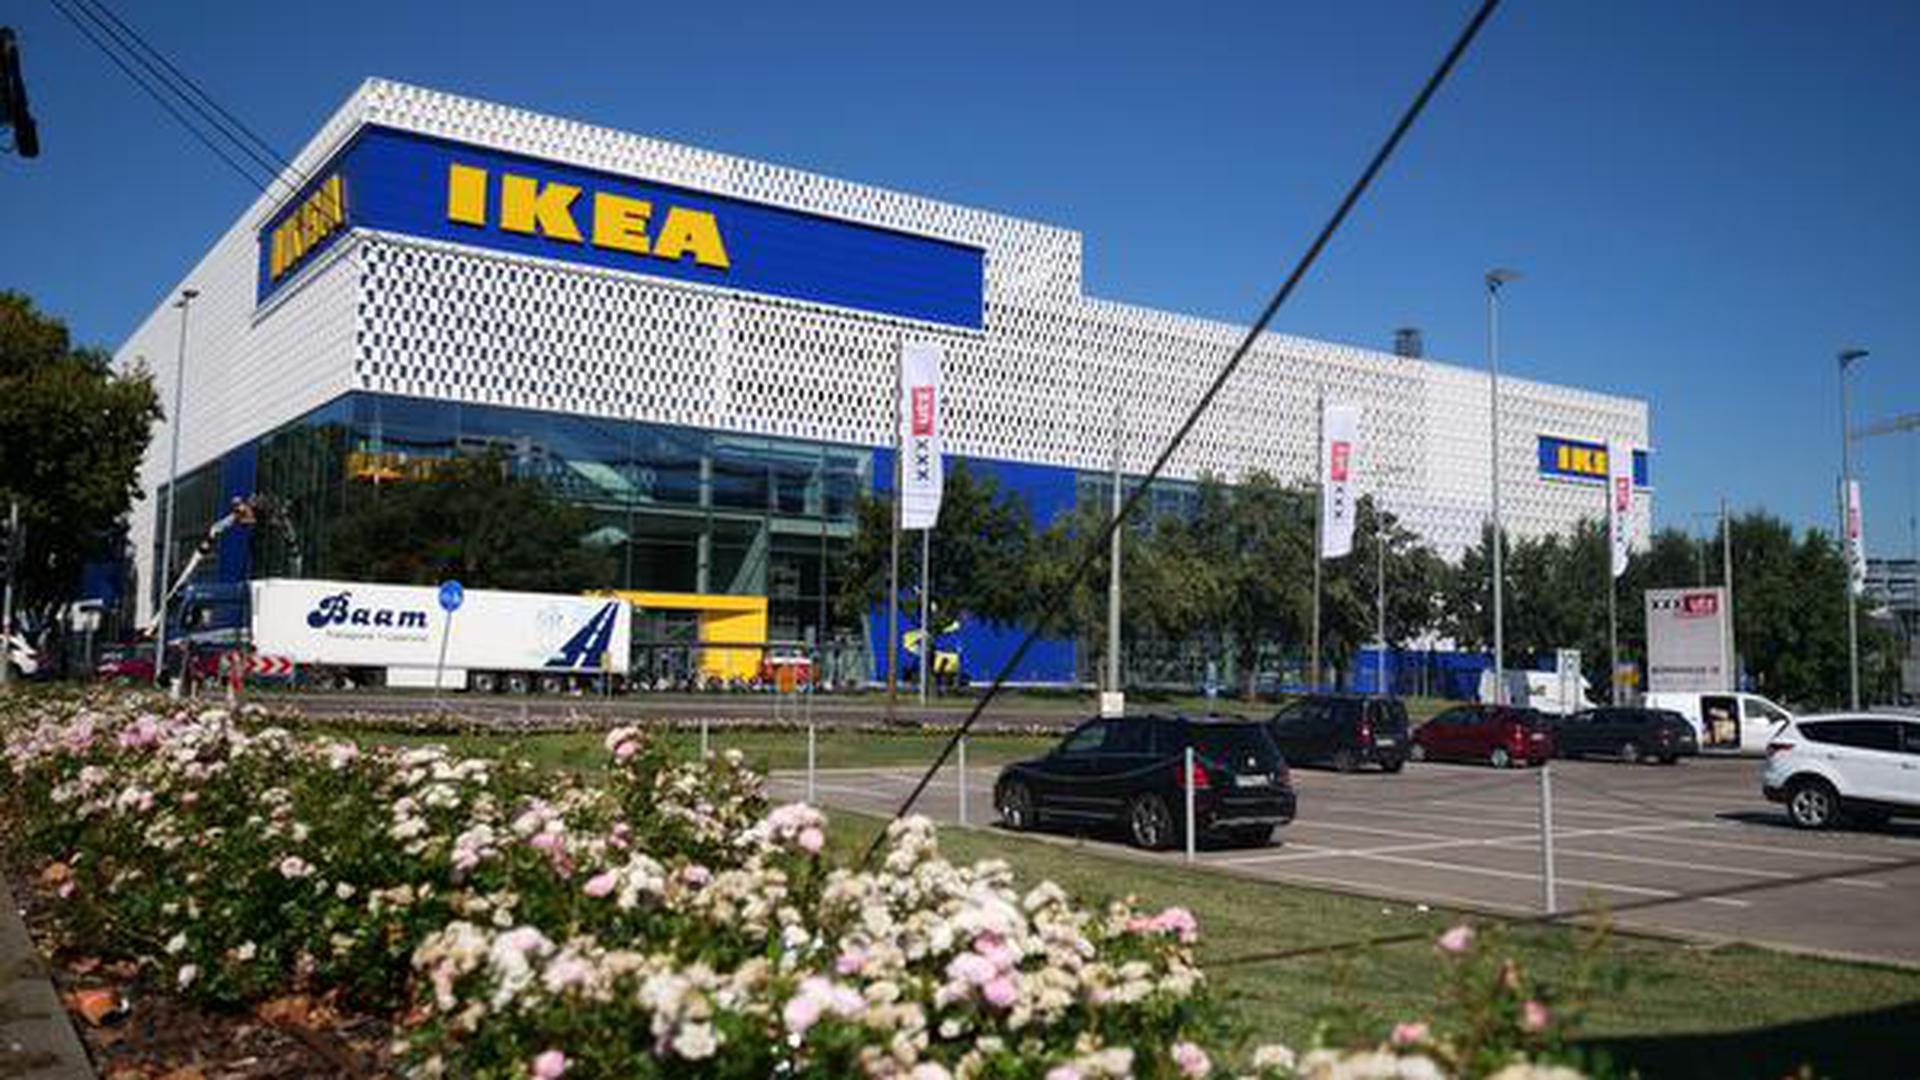 Ikea vor der Eroeffnung Foto Peter Sandbiller